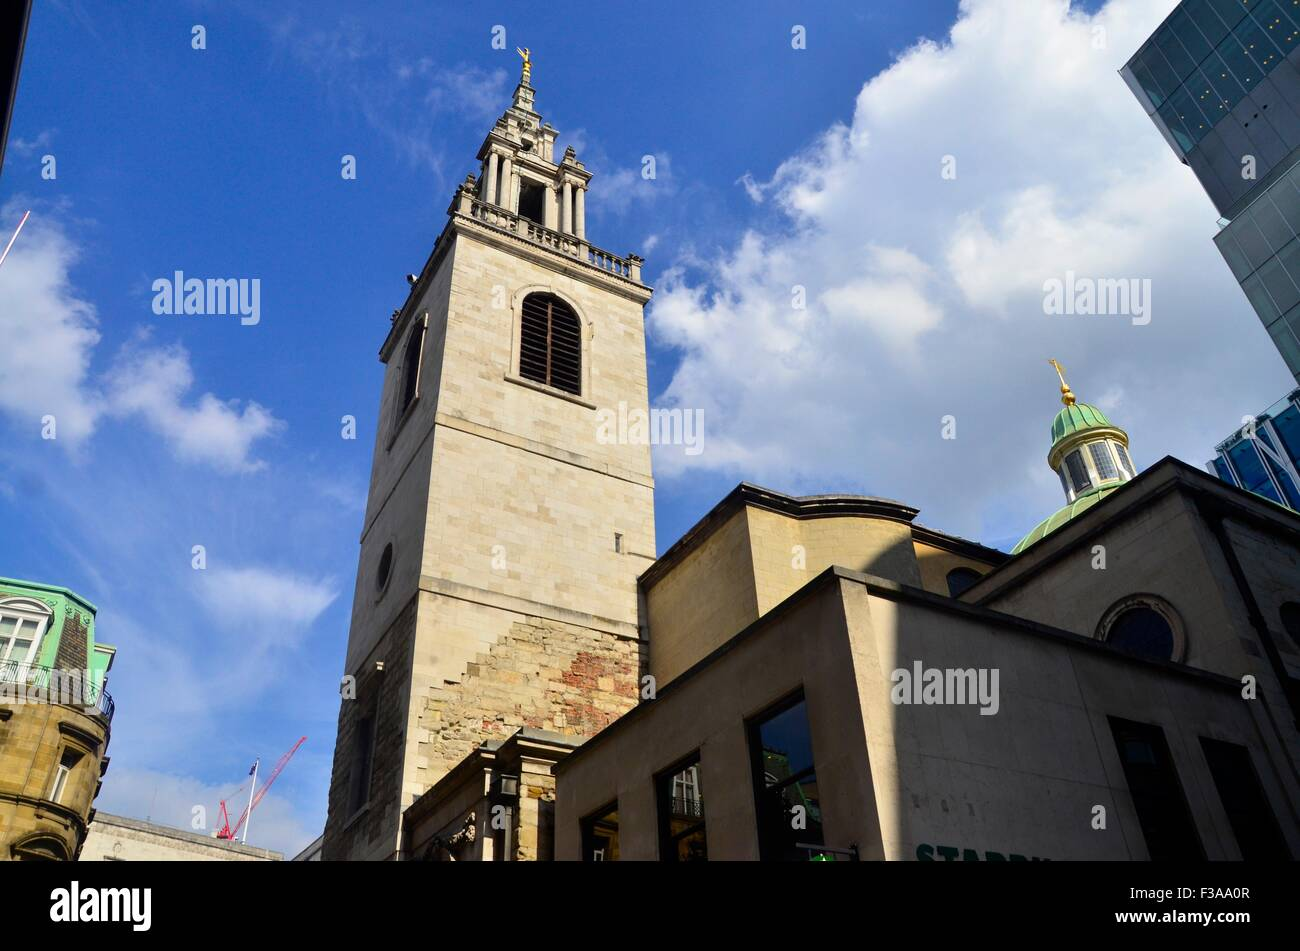 Kirche St. Stephan Walbrook, Wren Kirche, City of London, London, England, UK Stockfoto